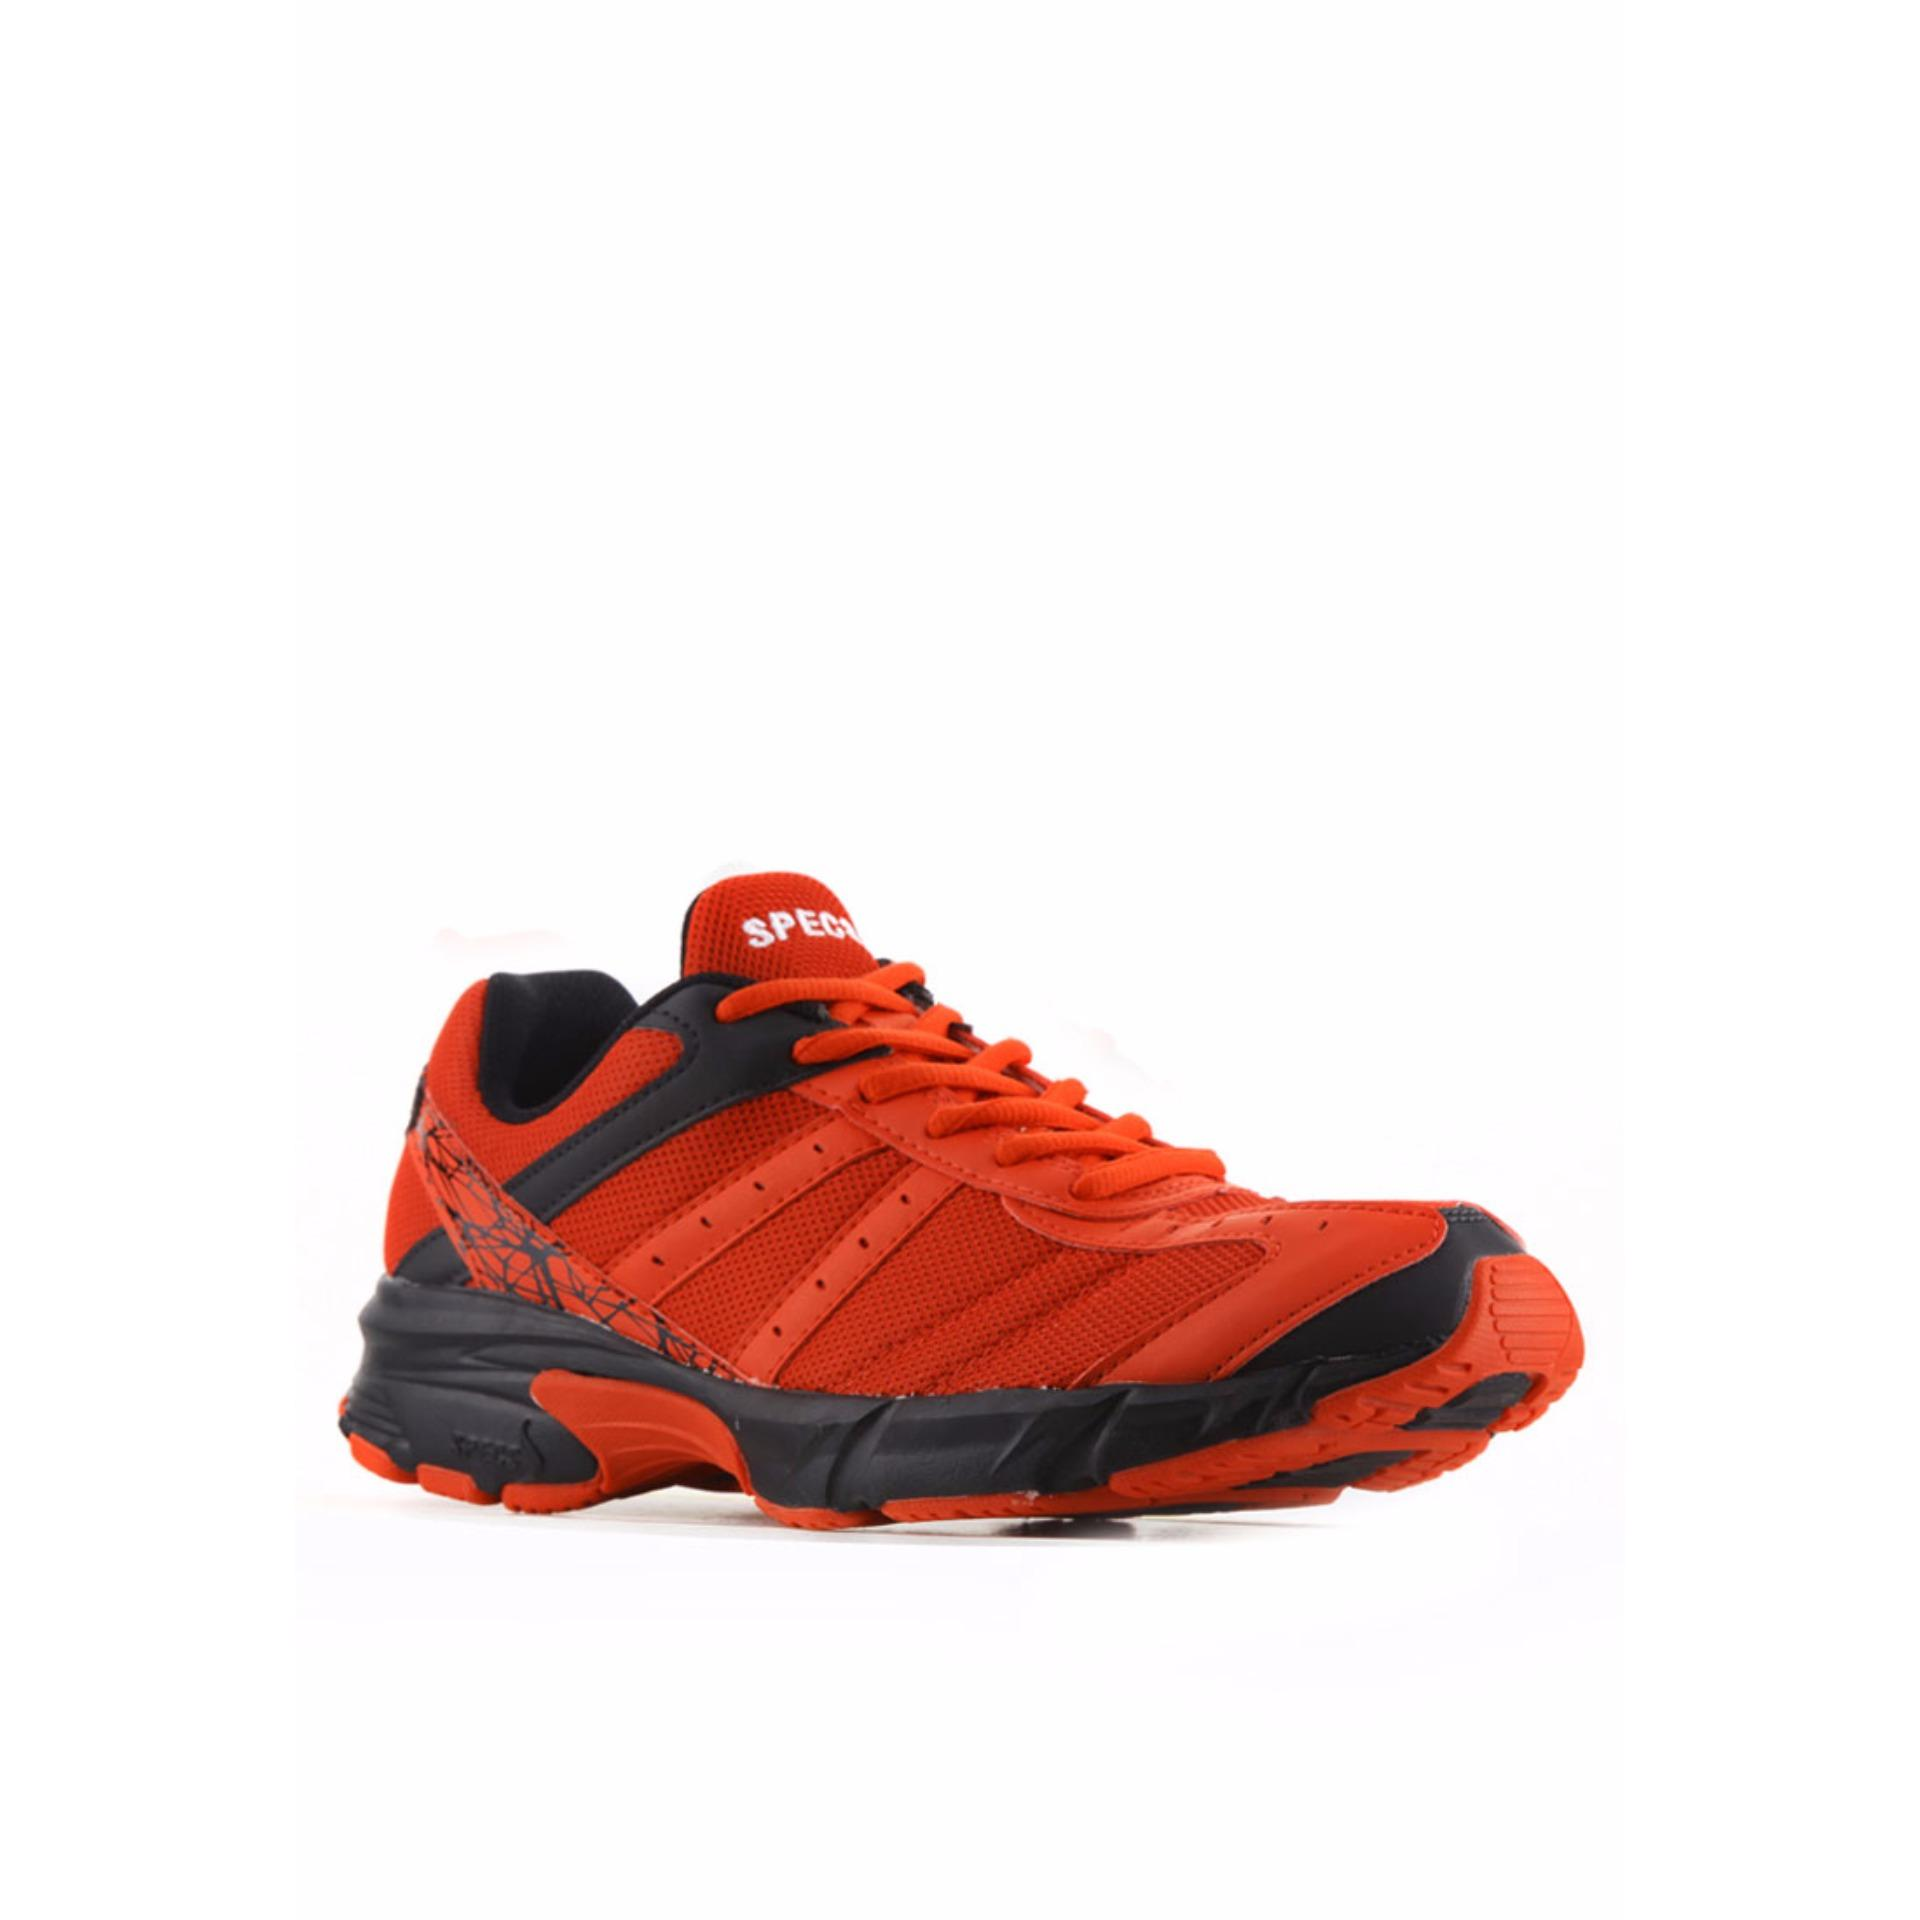 Exsport Paloma Merah Beli Harga Murah Tas Decadent Xc800322 Specs 200410 Sepatu Running Vinson Massif Hitam